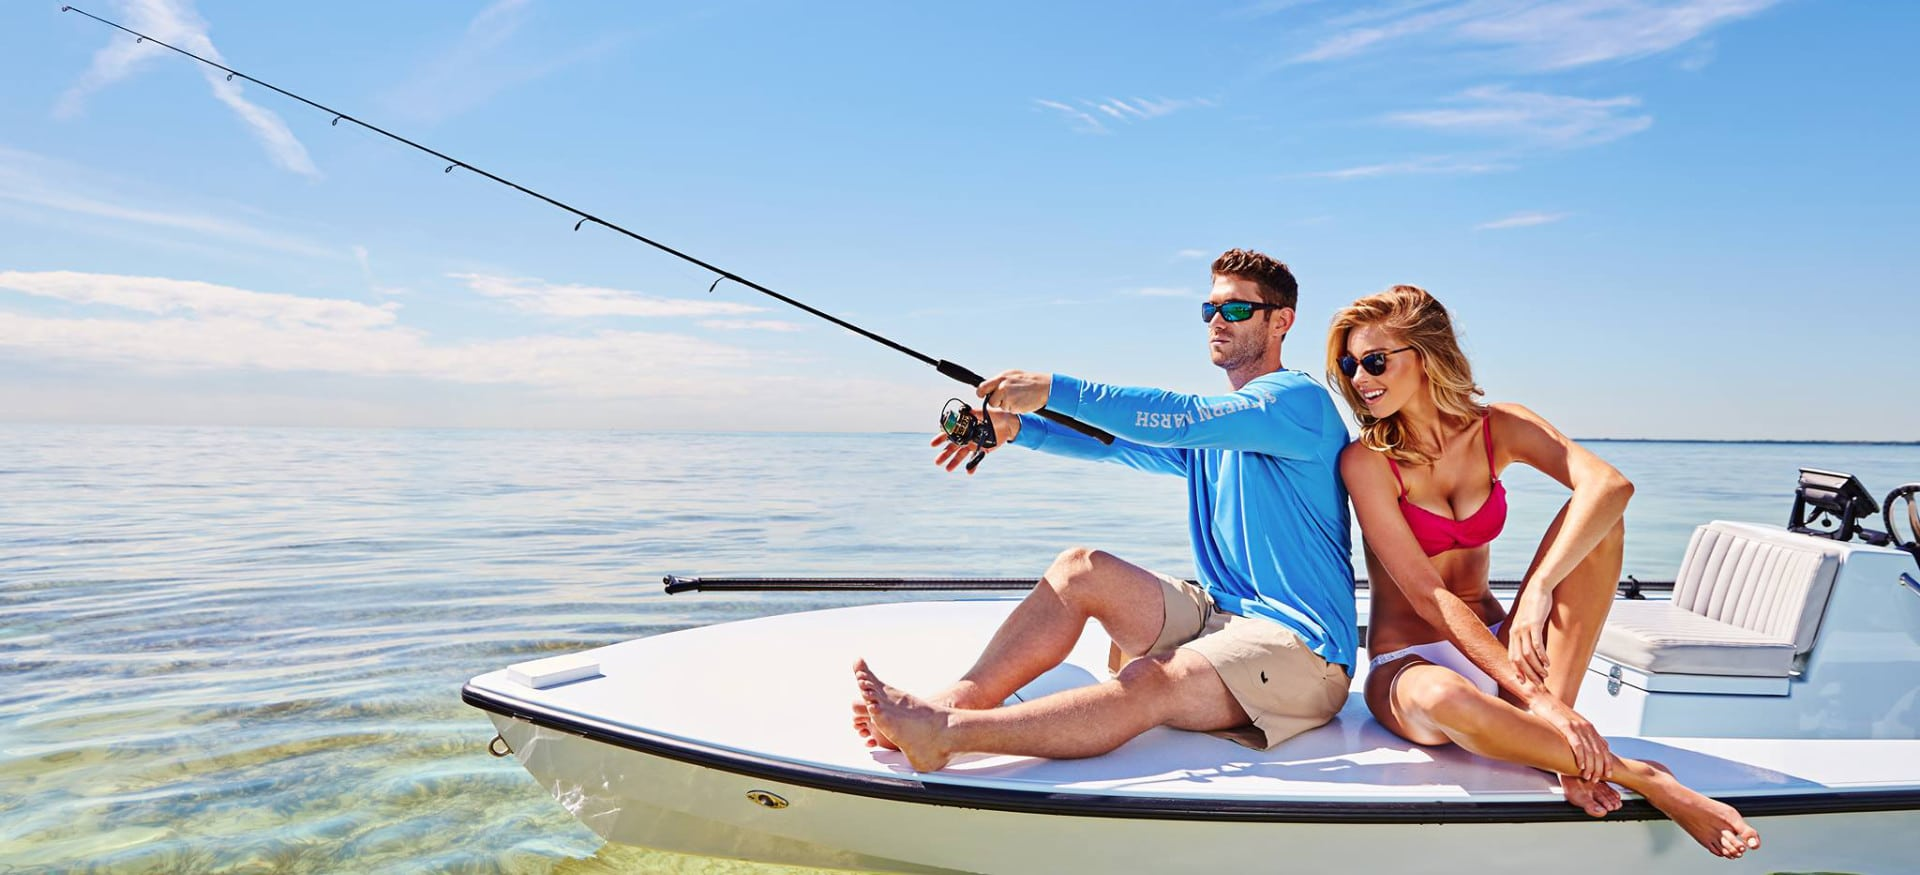 st george island shopping - boat fishing